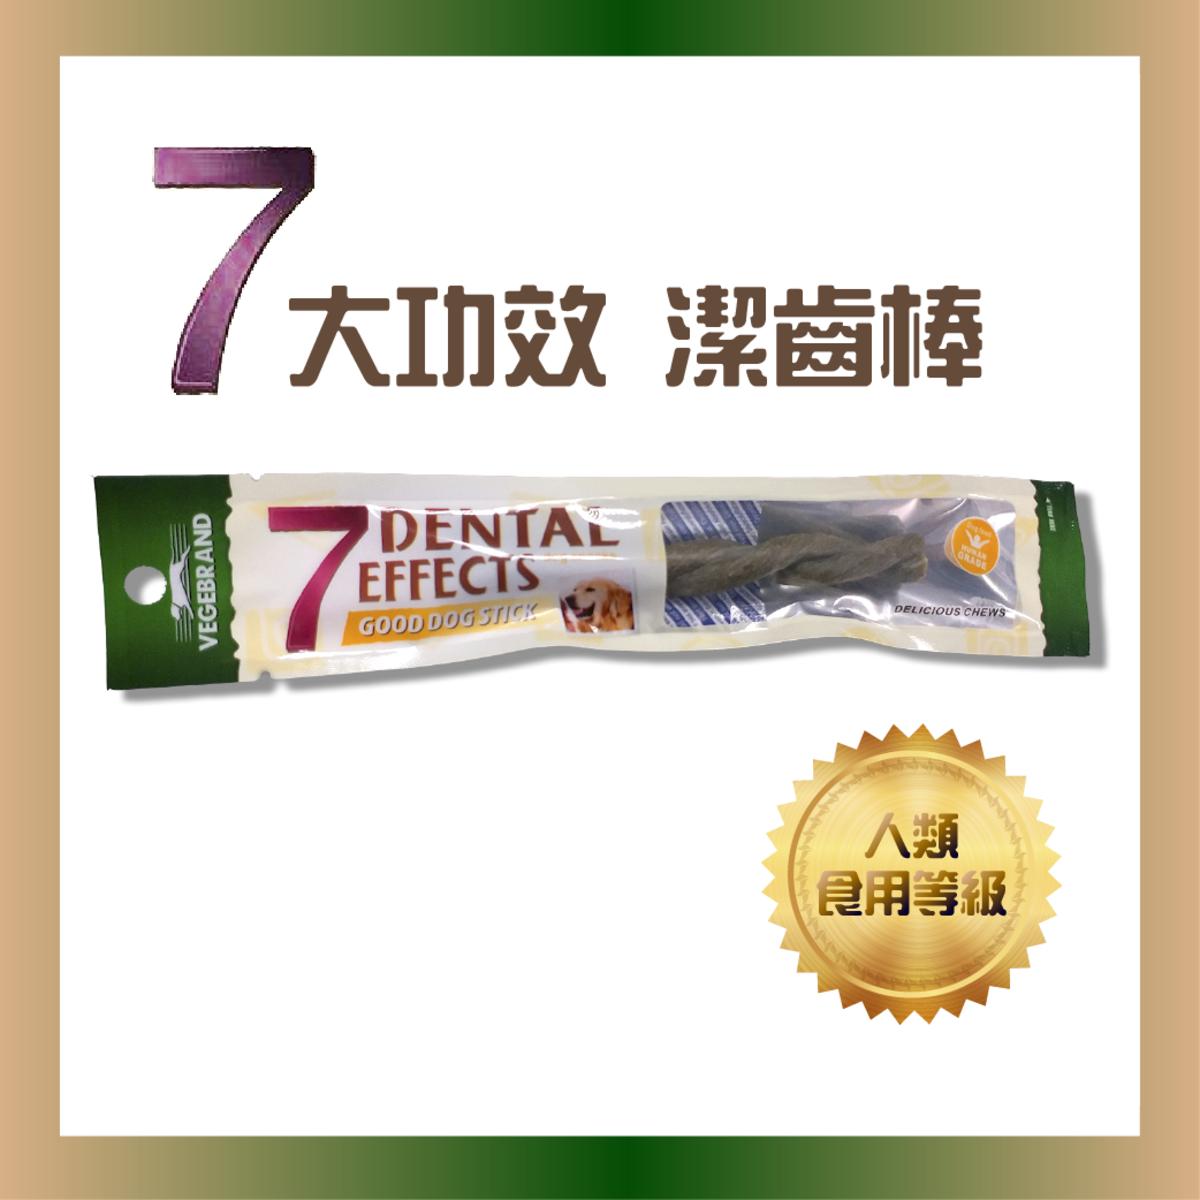 Avocado Dental Stick (VBD-1034)